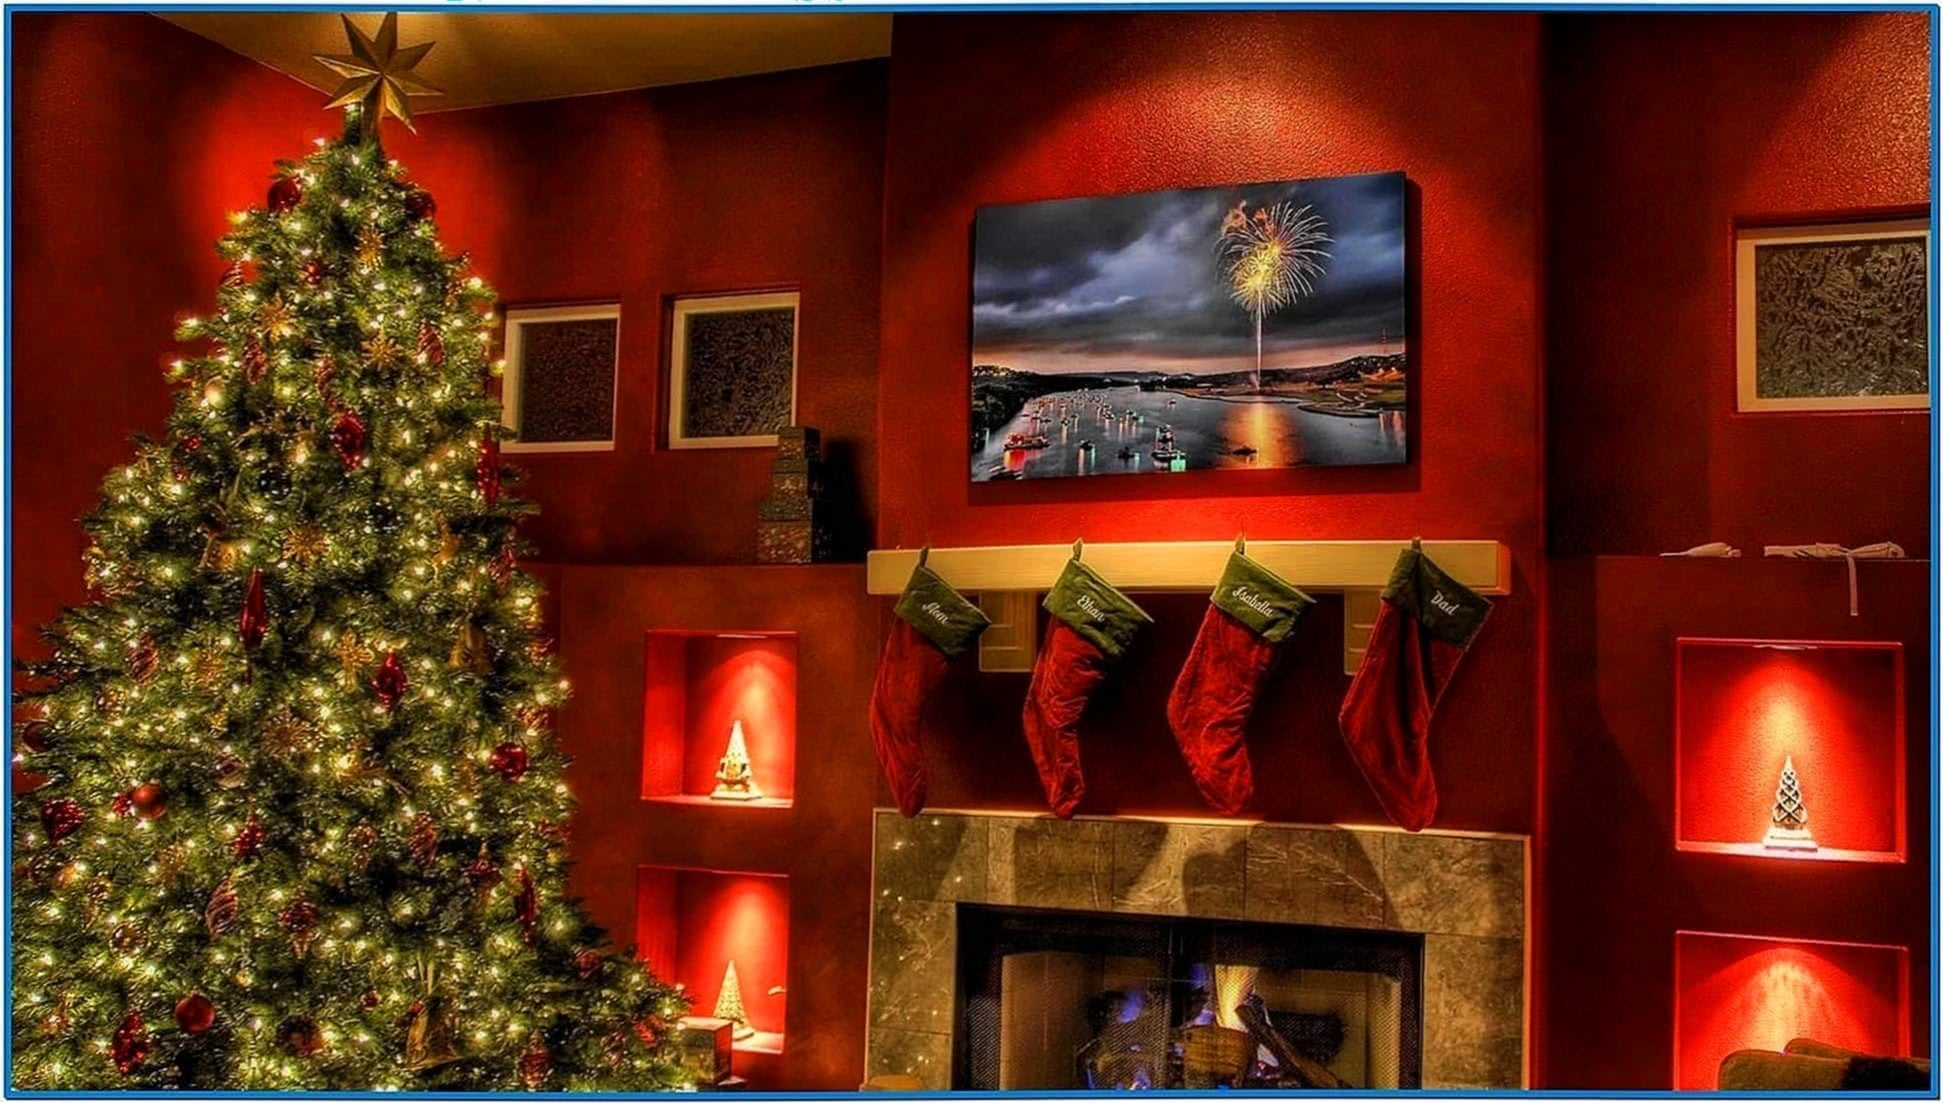 Hdtv Screensavers Fireplace Download Free